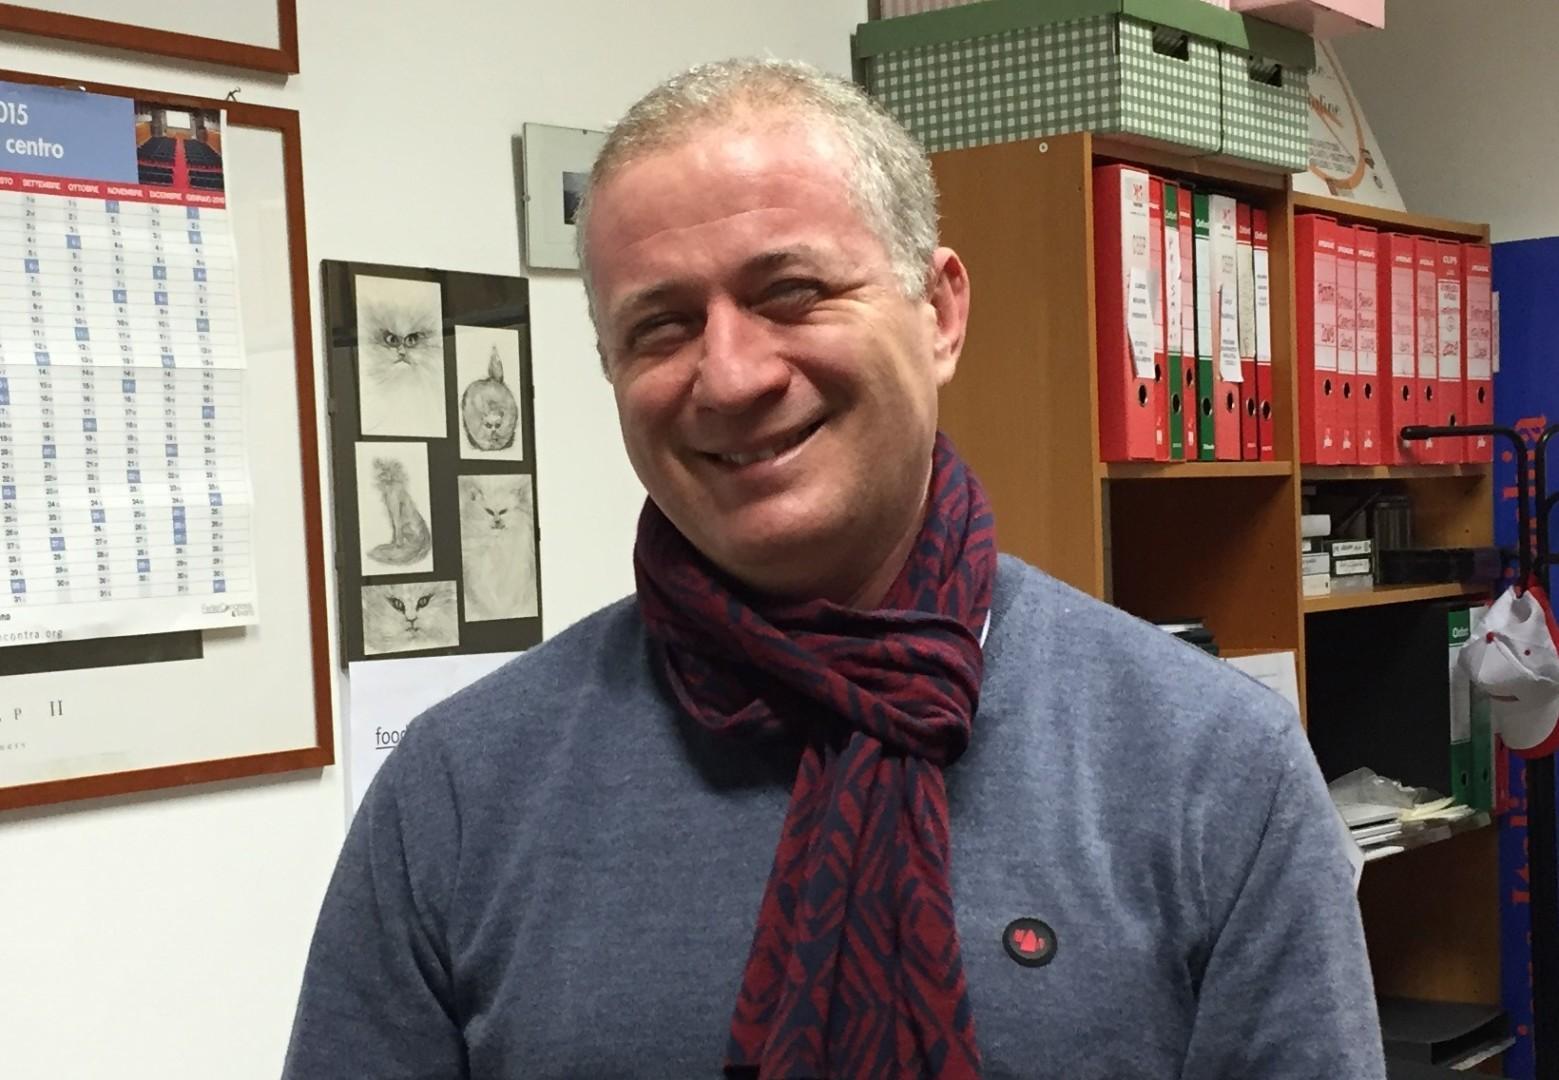 Fulvio LUBERTO